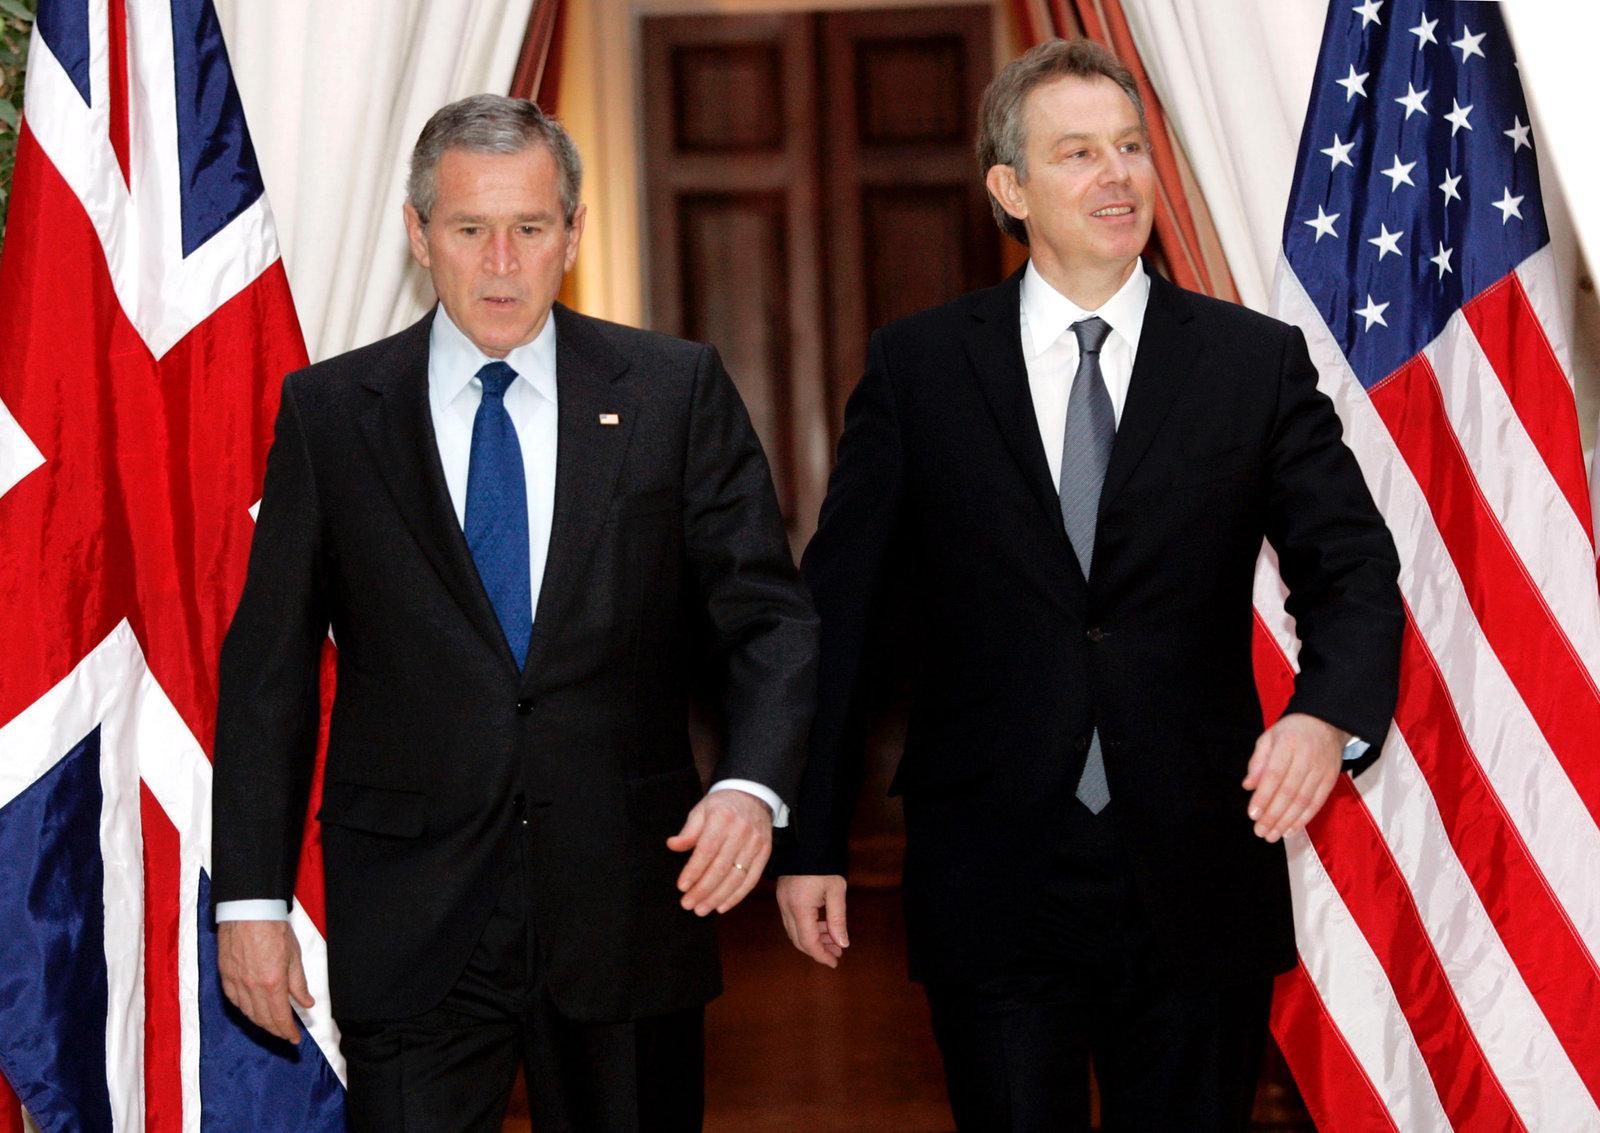 Kadhim 認為貝理雅和喬治布殊都是罪人,他們下令英美出兵,結果令伊拉克人痛不欲生。圖片來源:路透社